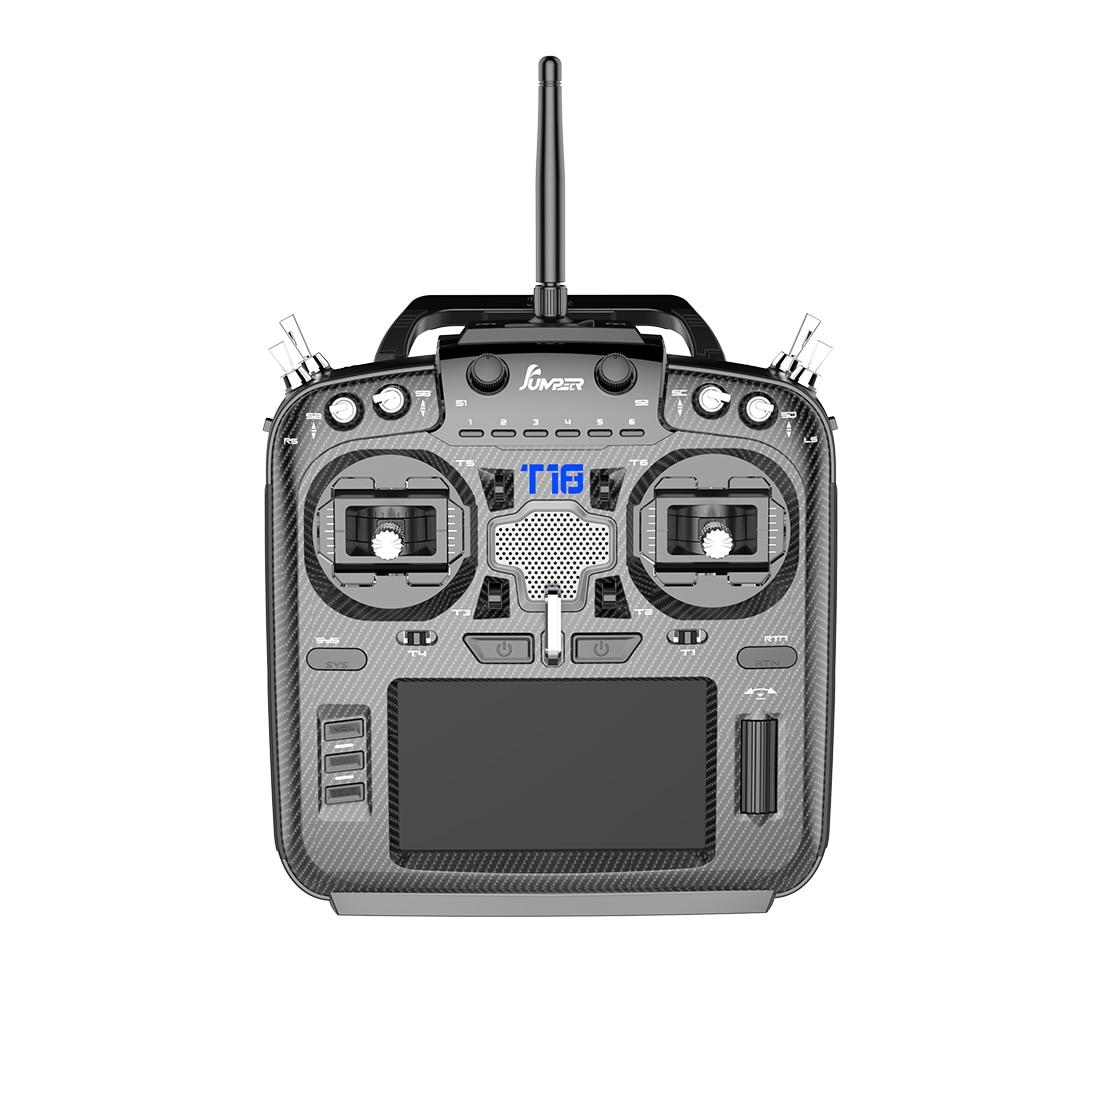 Pré-venda jumper t18 salão cardan open source multi-protocolo transmissor de rádio atualização jp4in1 para jp5in1 módulo 2.4g 915mhz vs t16